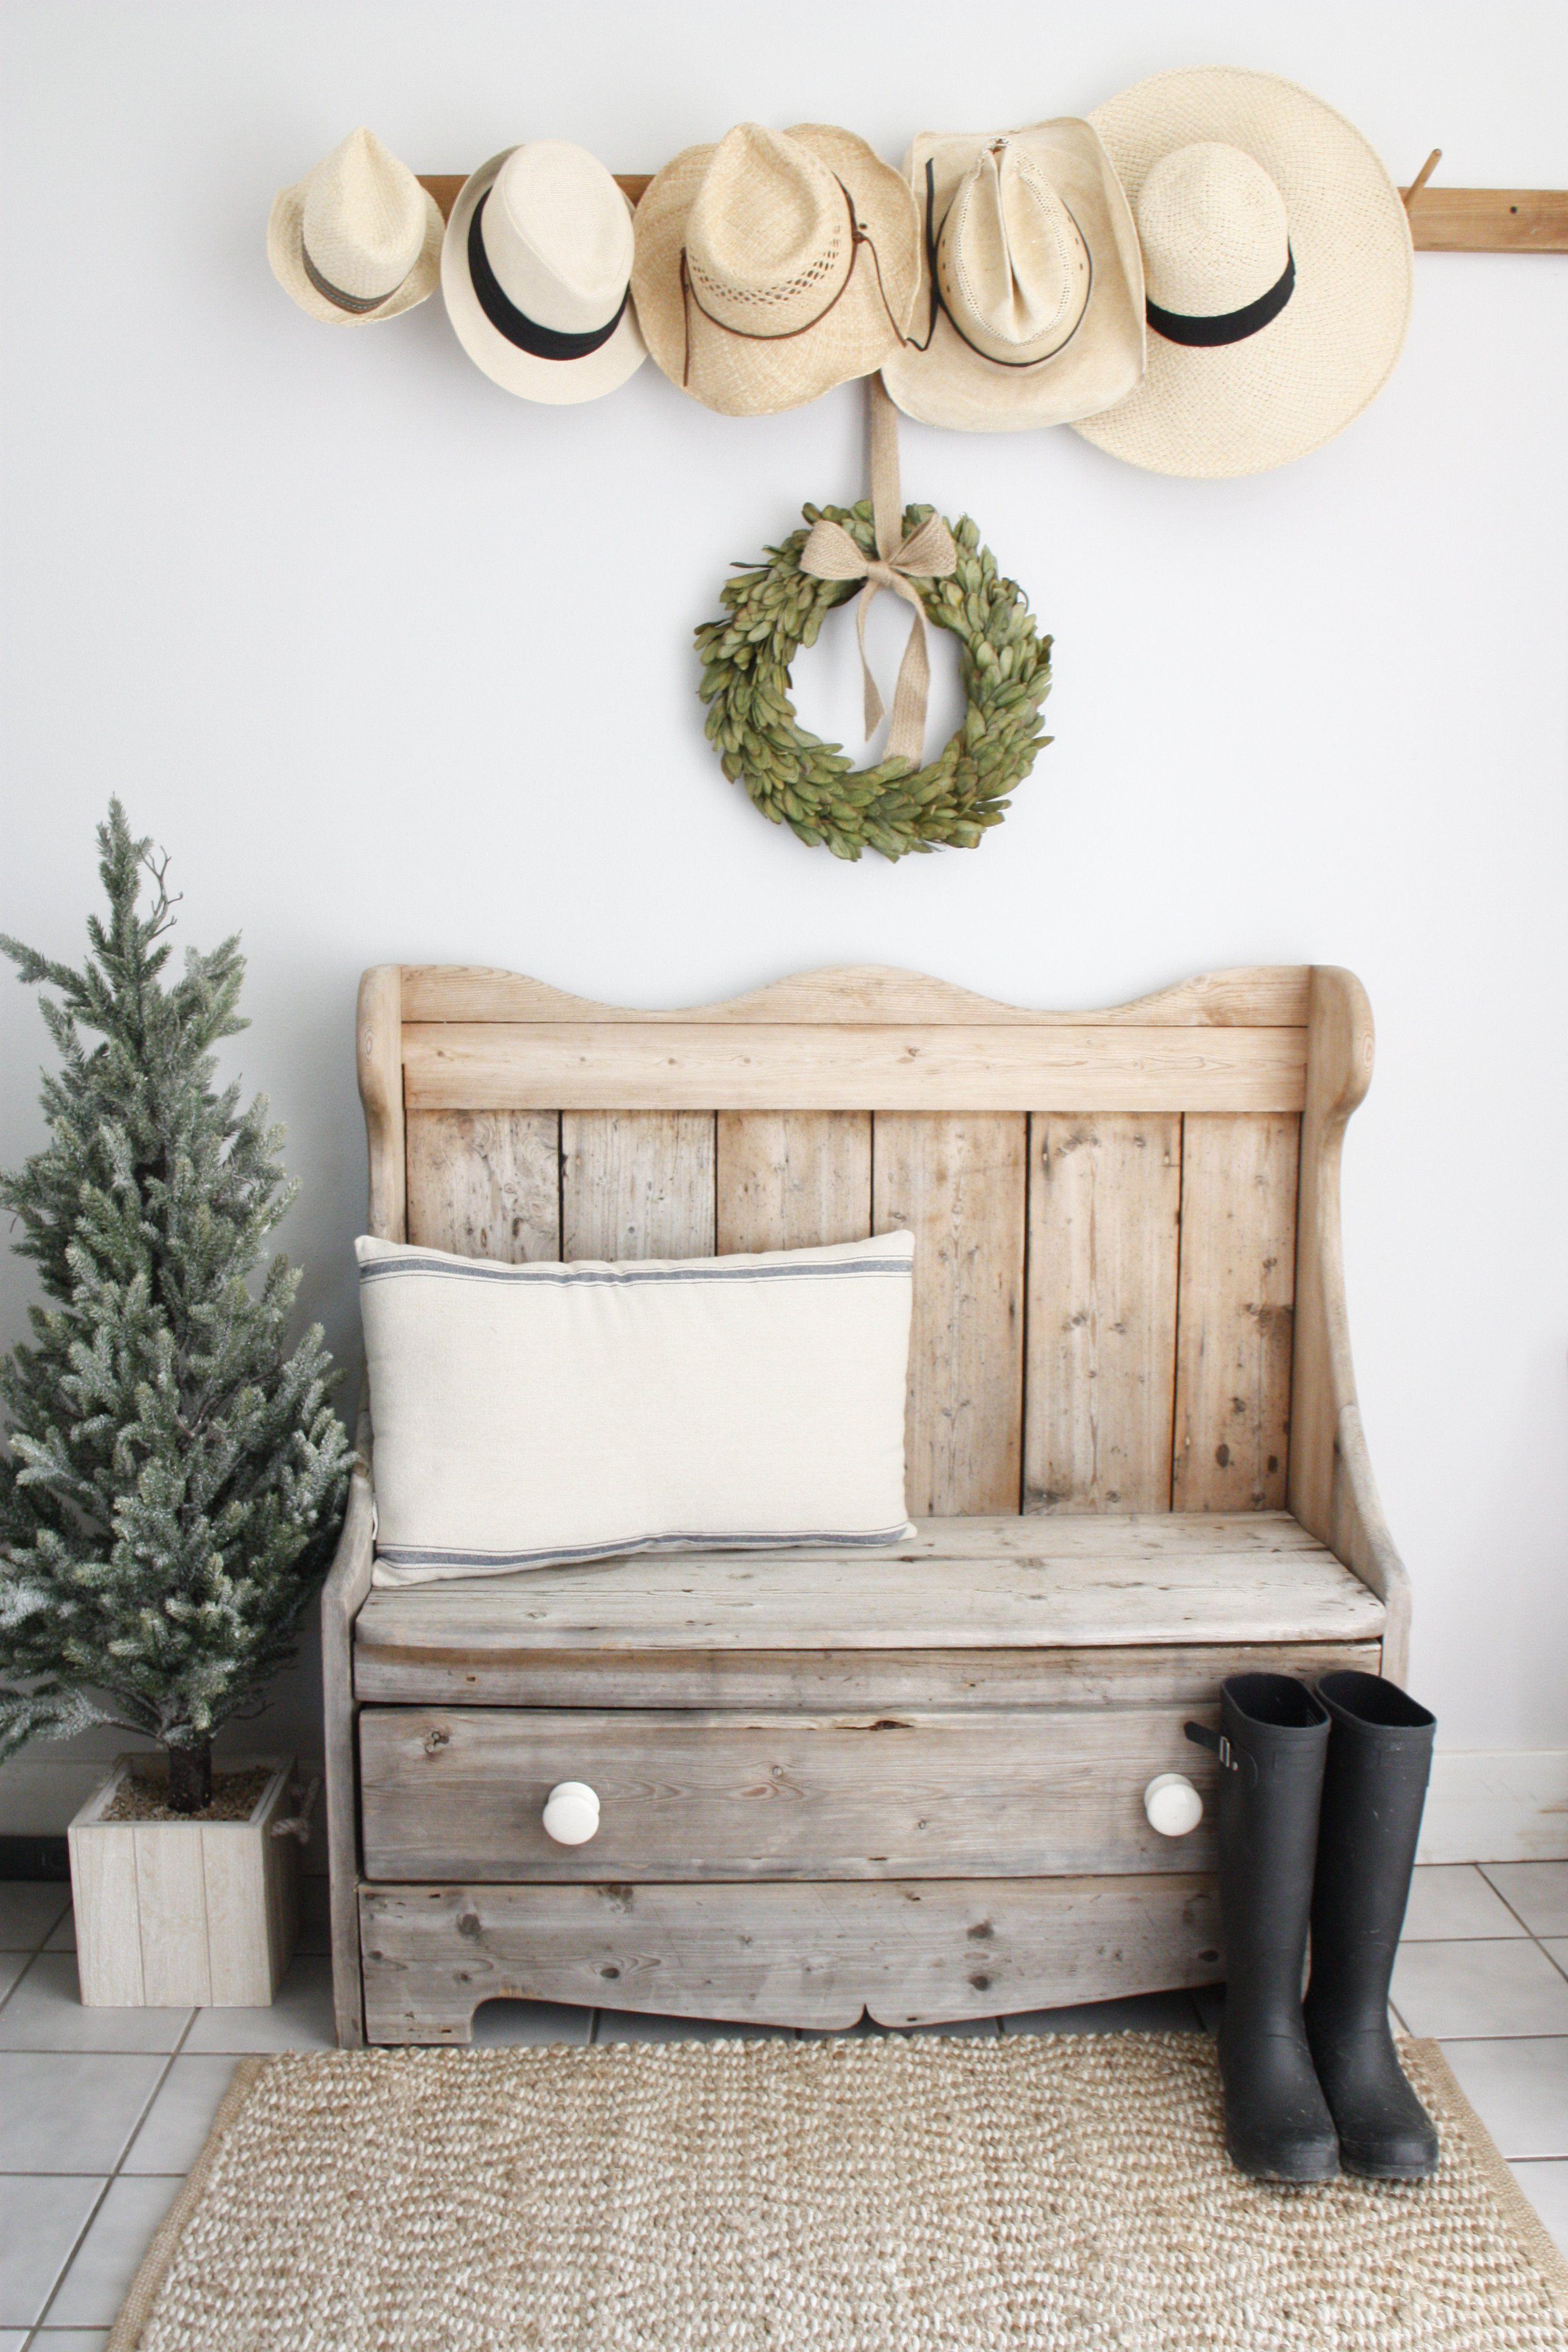 Pin de Inessa Mesa en Home decor | Pinterest | Recibidor, Paletas y ...